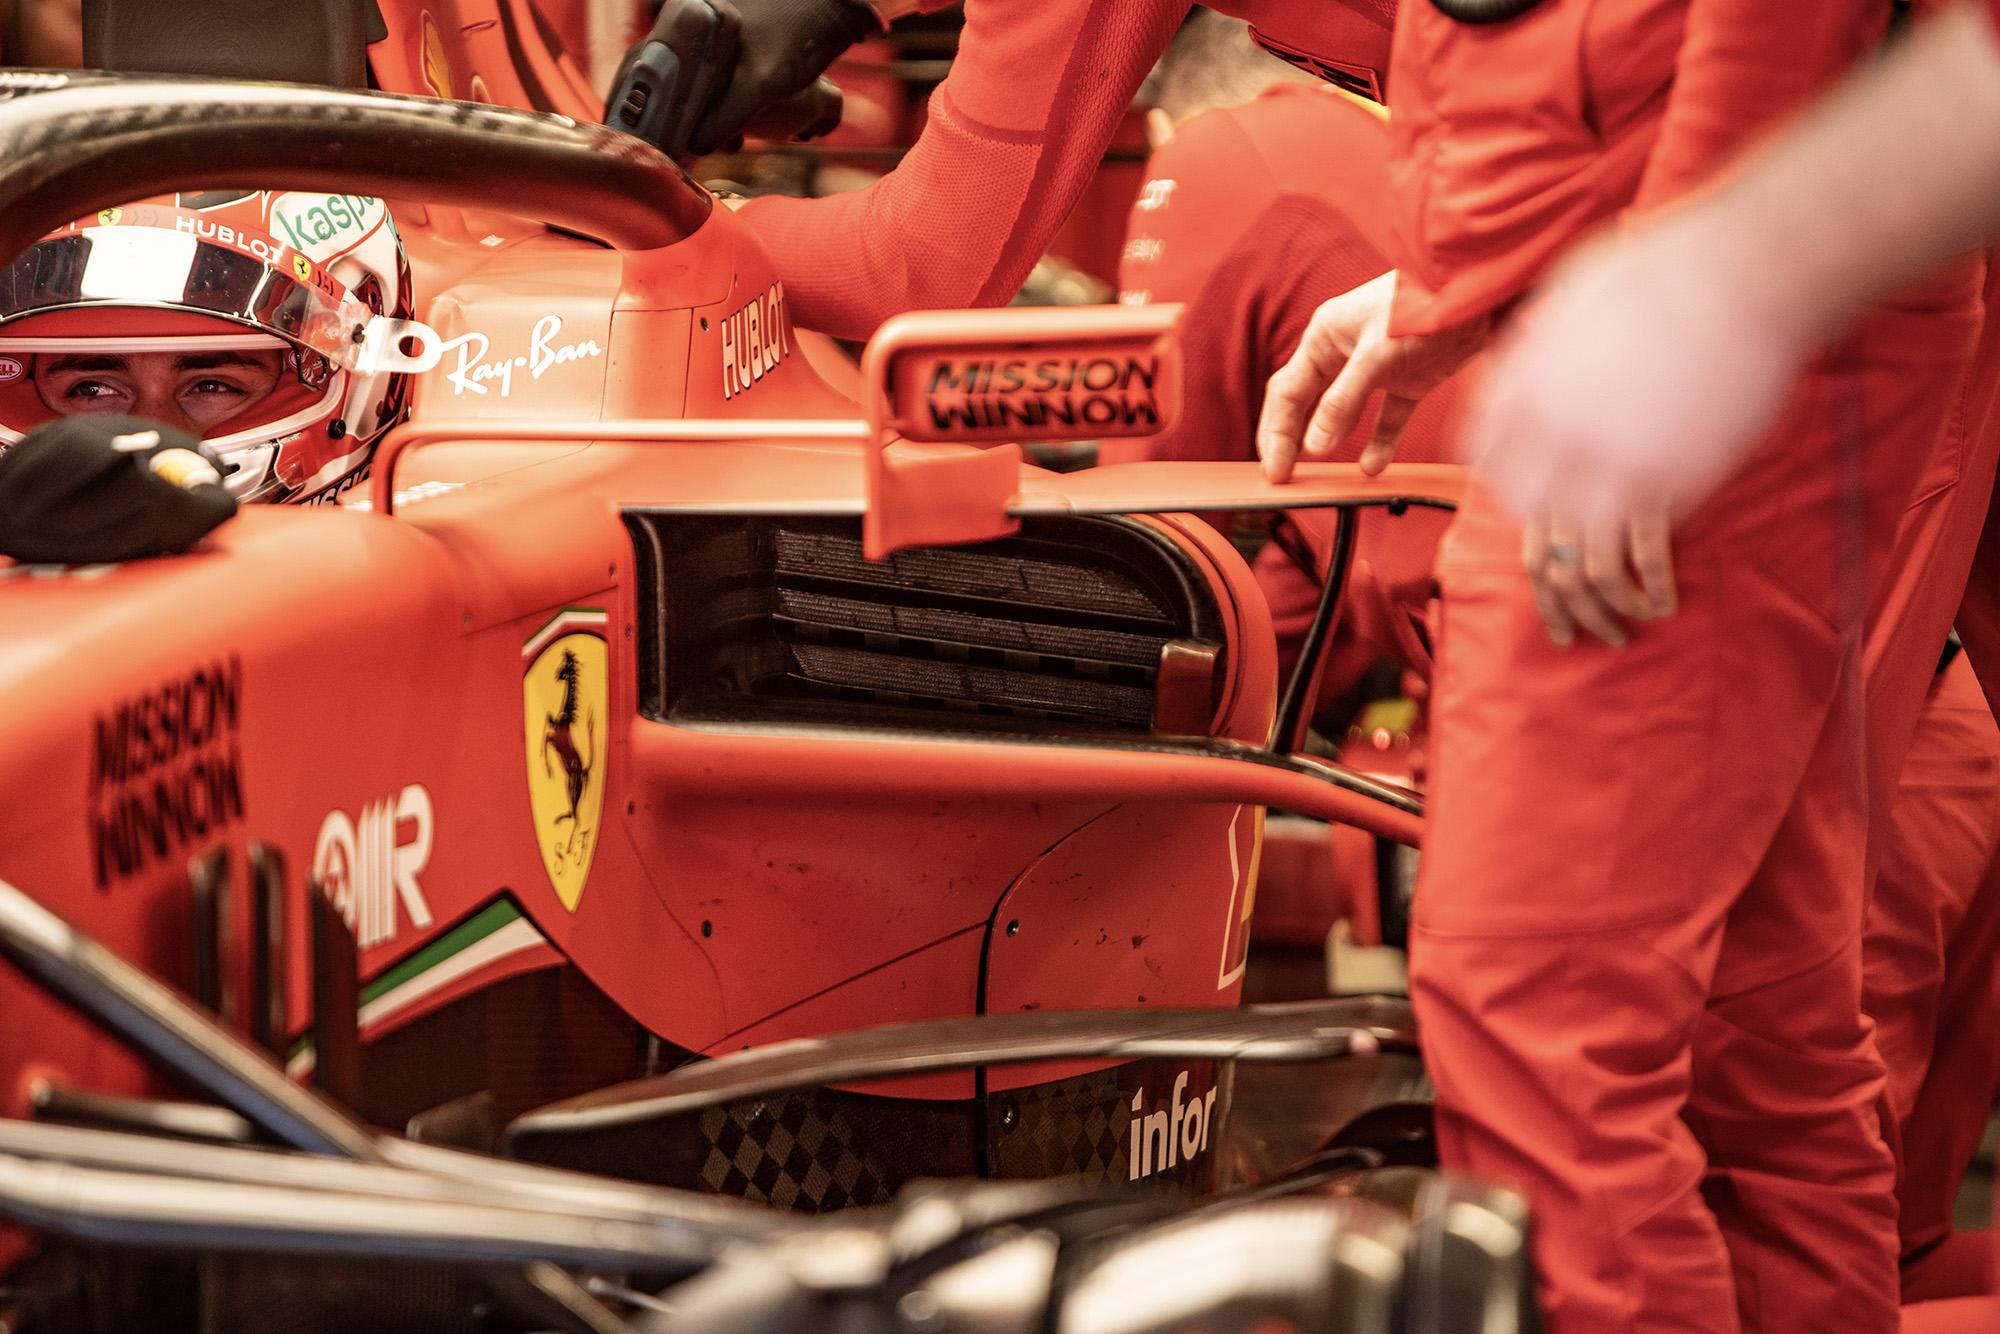 Ferrari sidepod during 2020 f1 preseason testing